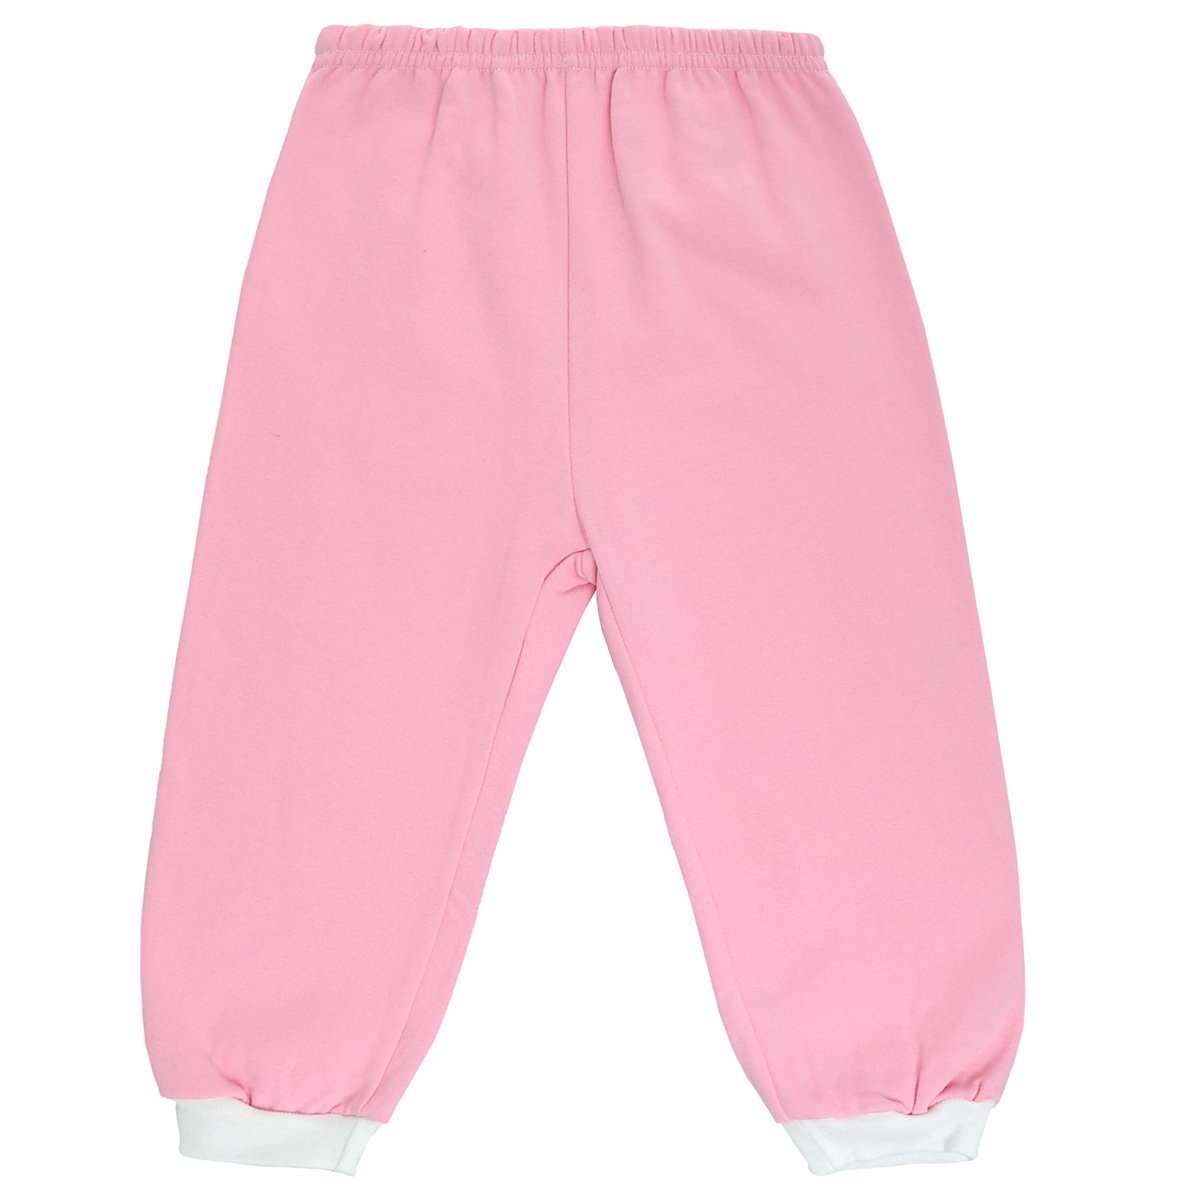 Ползунки Трон-Плюс, цвет: розовый. 5325. Размер 86, 18 месяцев